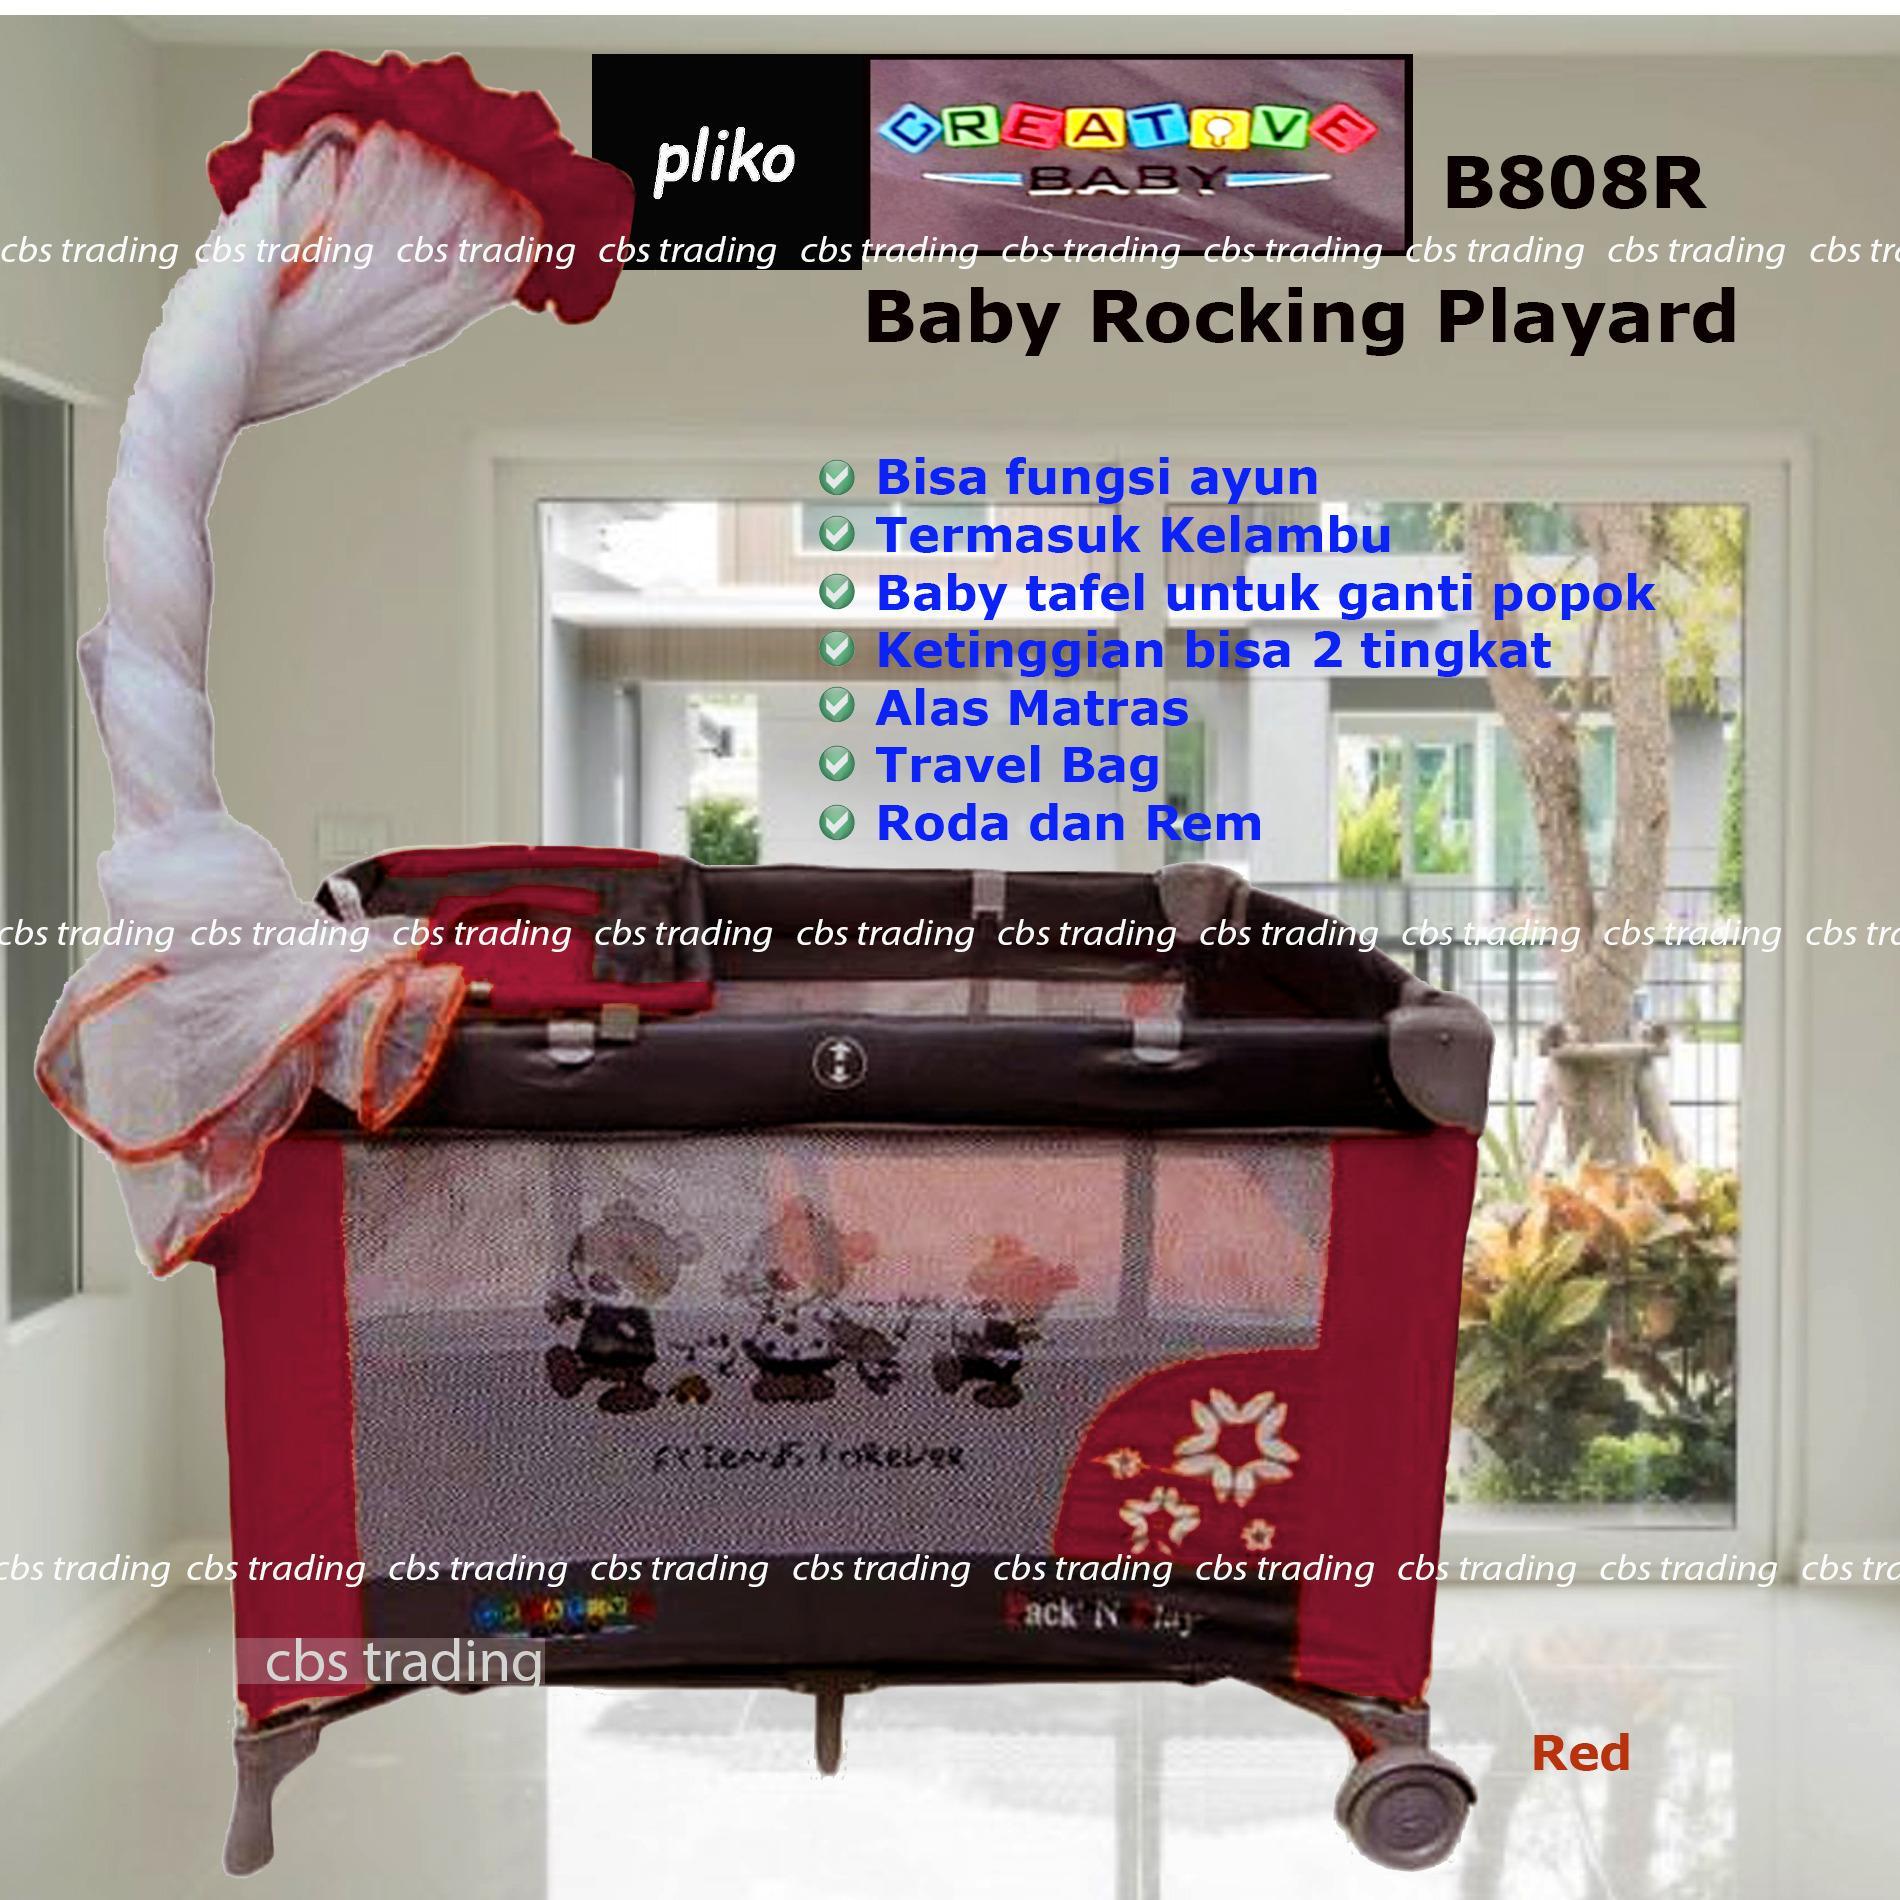 List Harga Ranjang Mini November 2018 Terlengkap Susun Mbb 09 Dengan Kasur Busa Pliko Creative Baby Rocking Playard 808 Box Bayi Merah